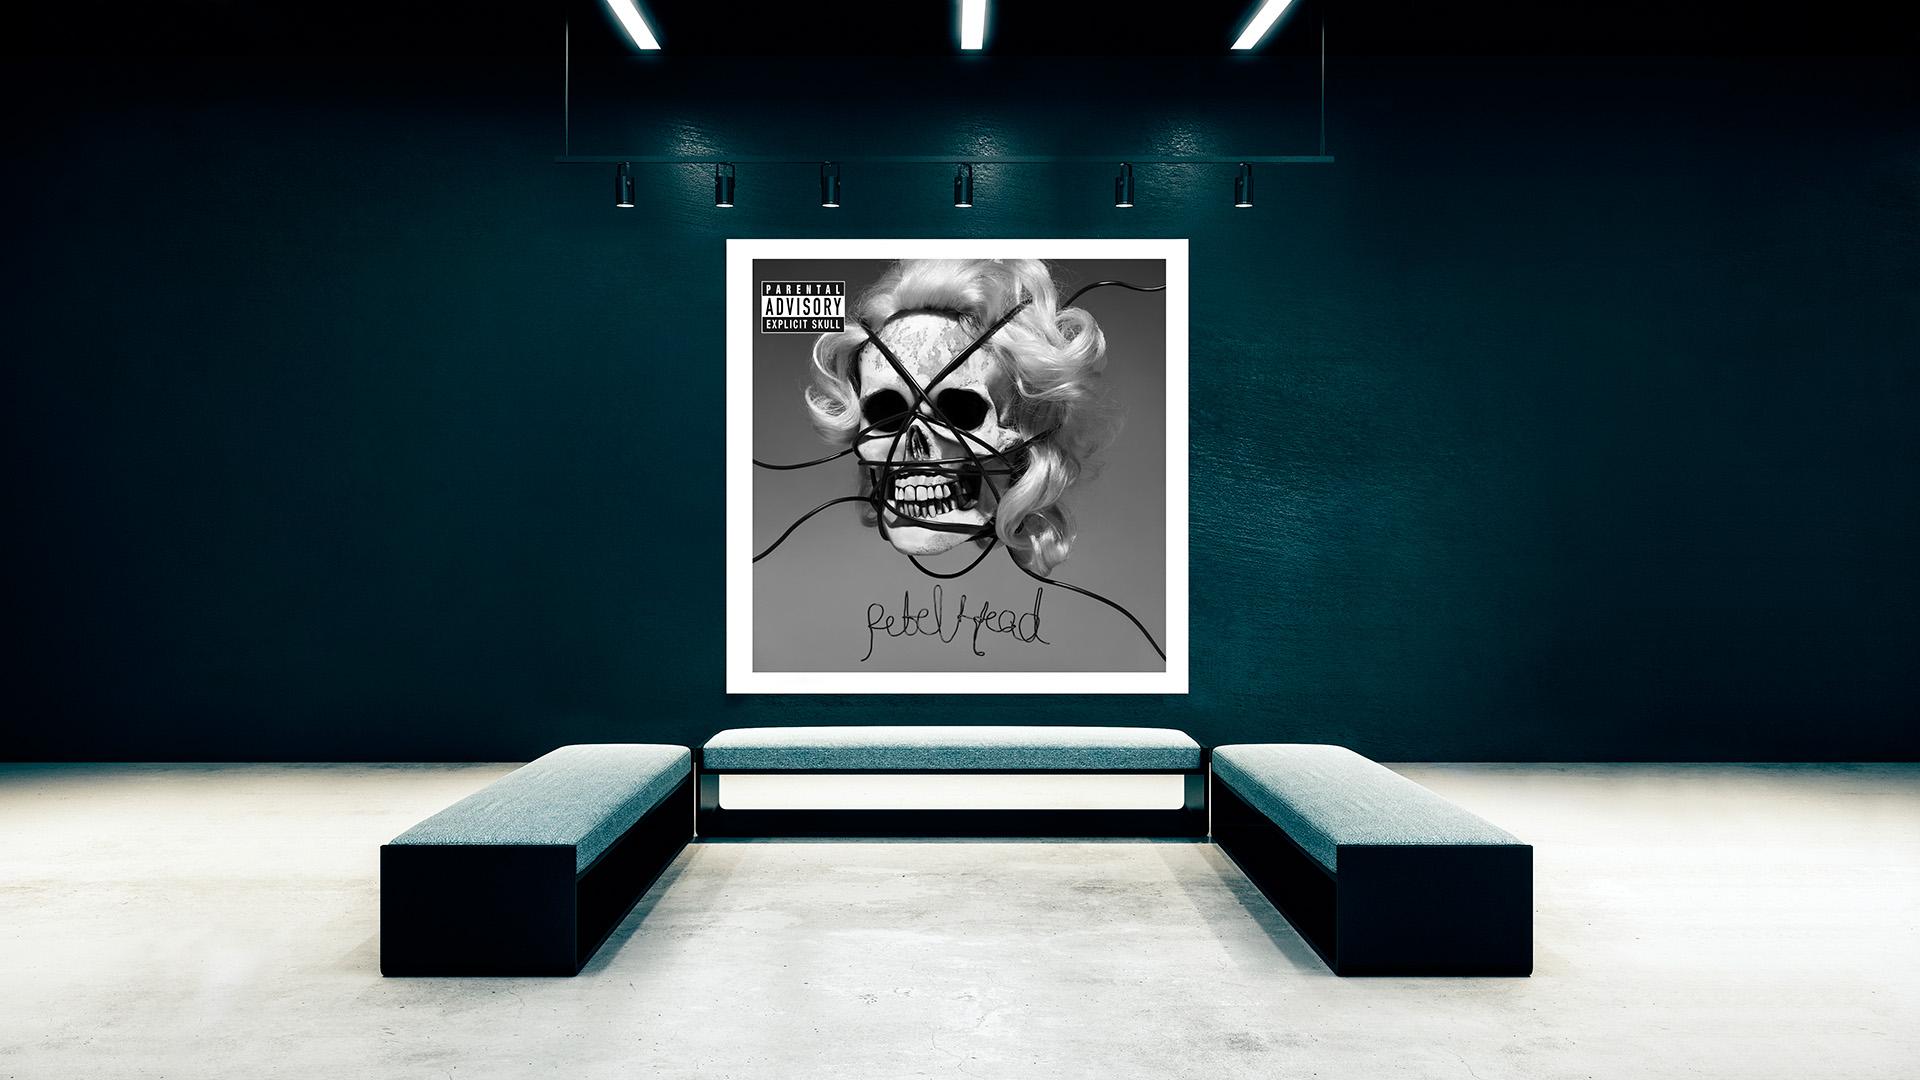 Exposicion-Sintora-Memento-mori-rebel-head-cover-madonna-Horno-Art-Virtual-Gallery-galeria-arte-fotografia-artistica-decorativa